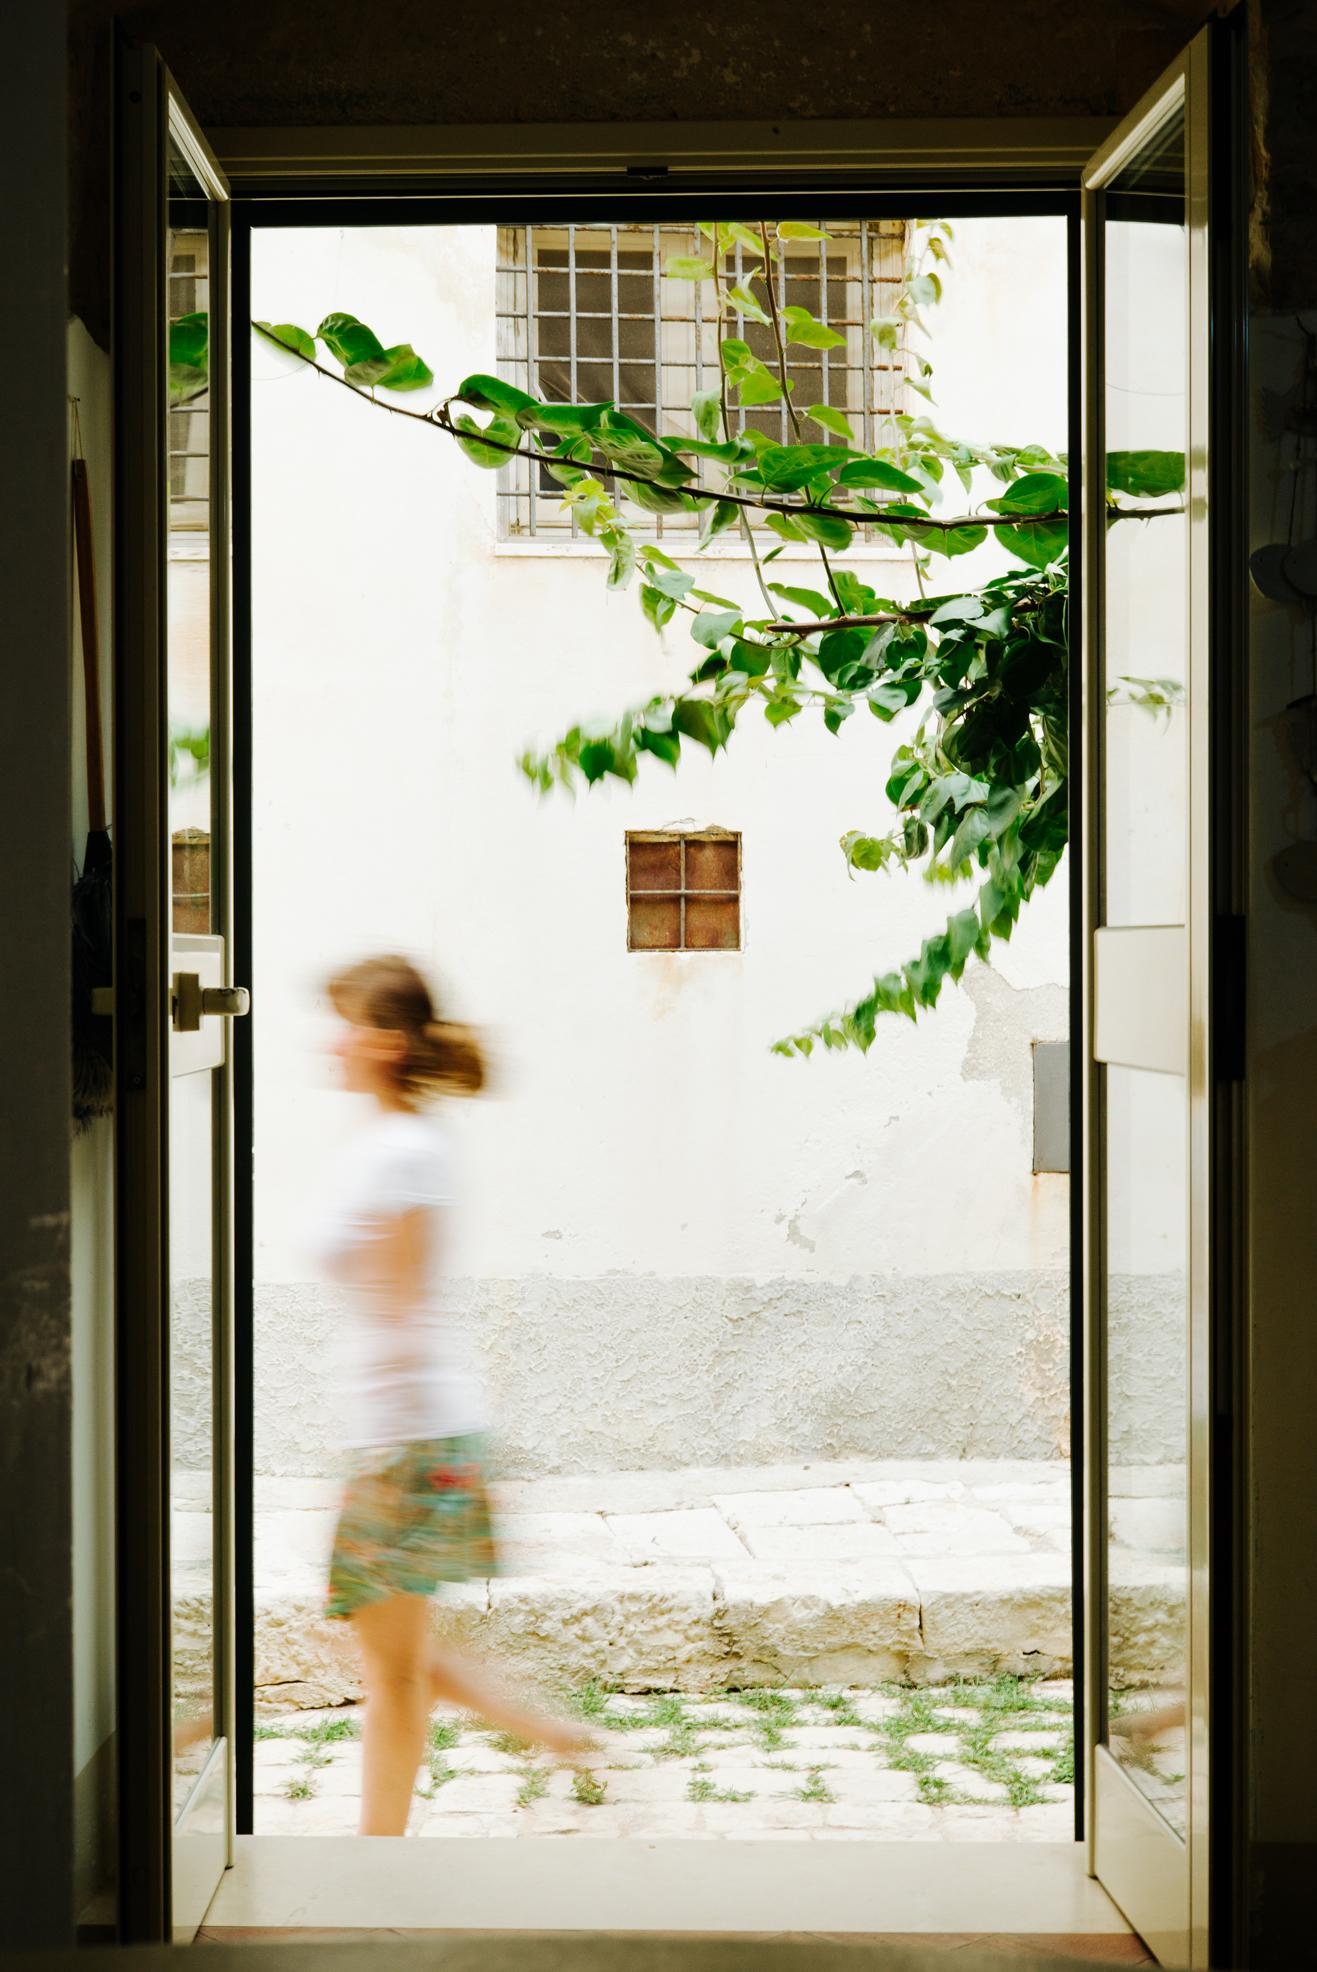 24sampieri-casa-vacanze-sicilia-appartamento-sicily-holiday-apartment-casa-del-pescatore-italia-italy.jpg